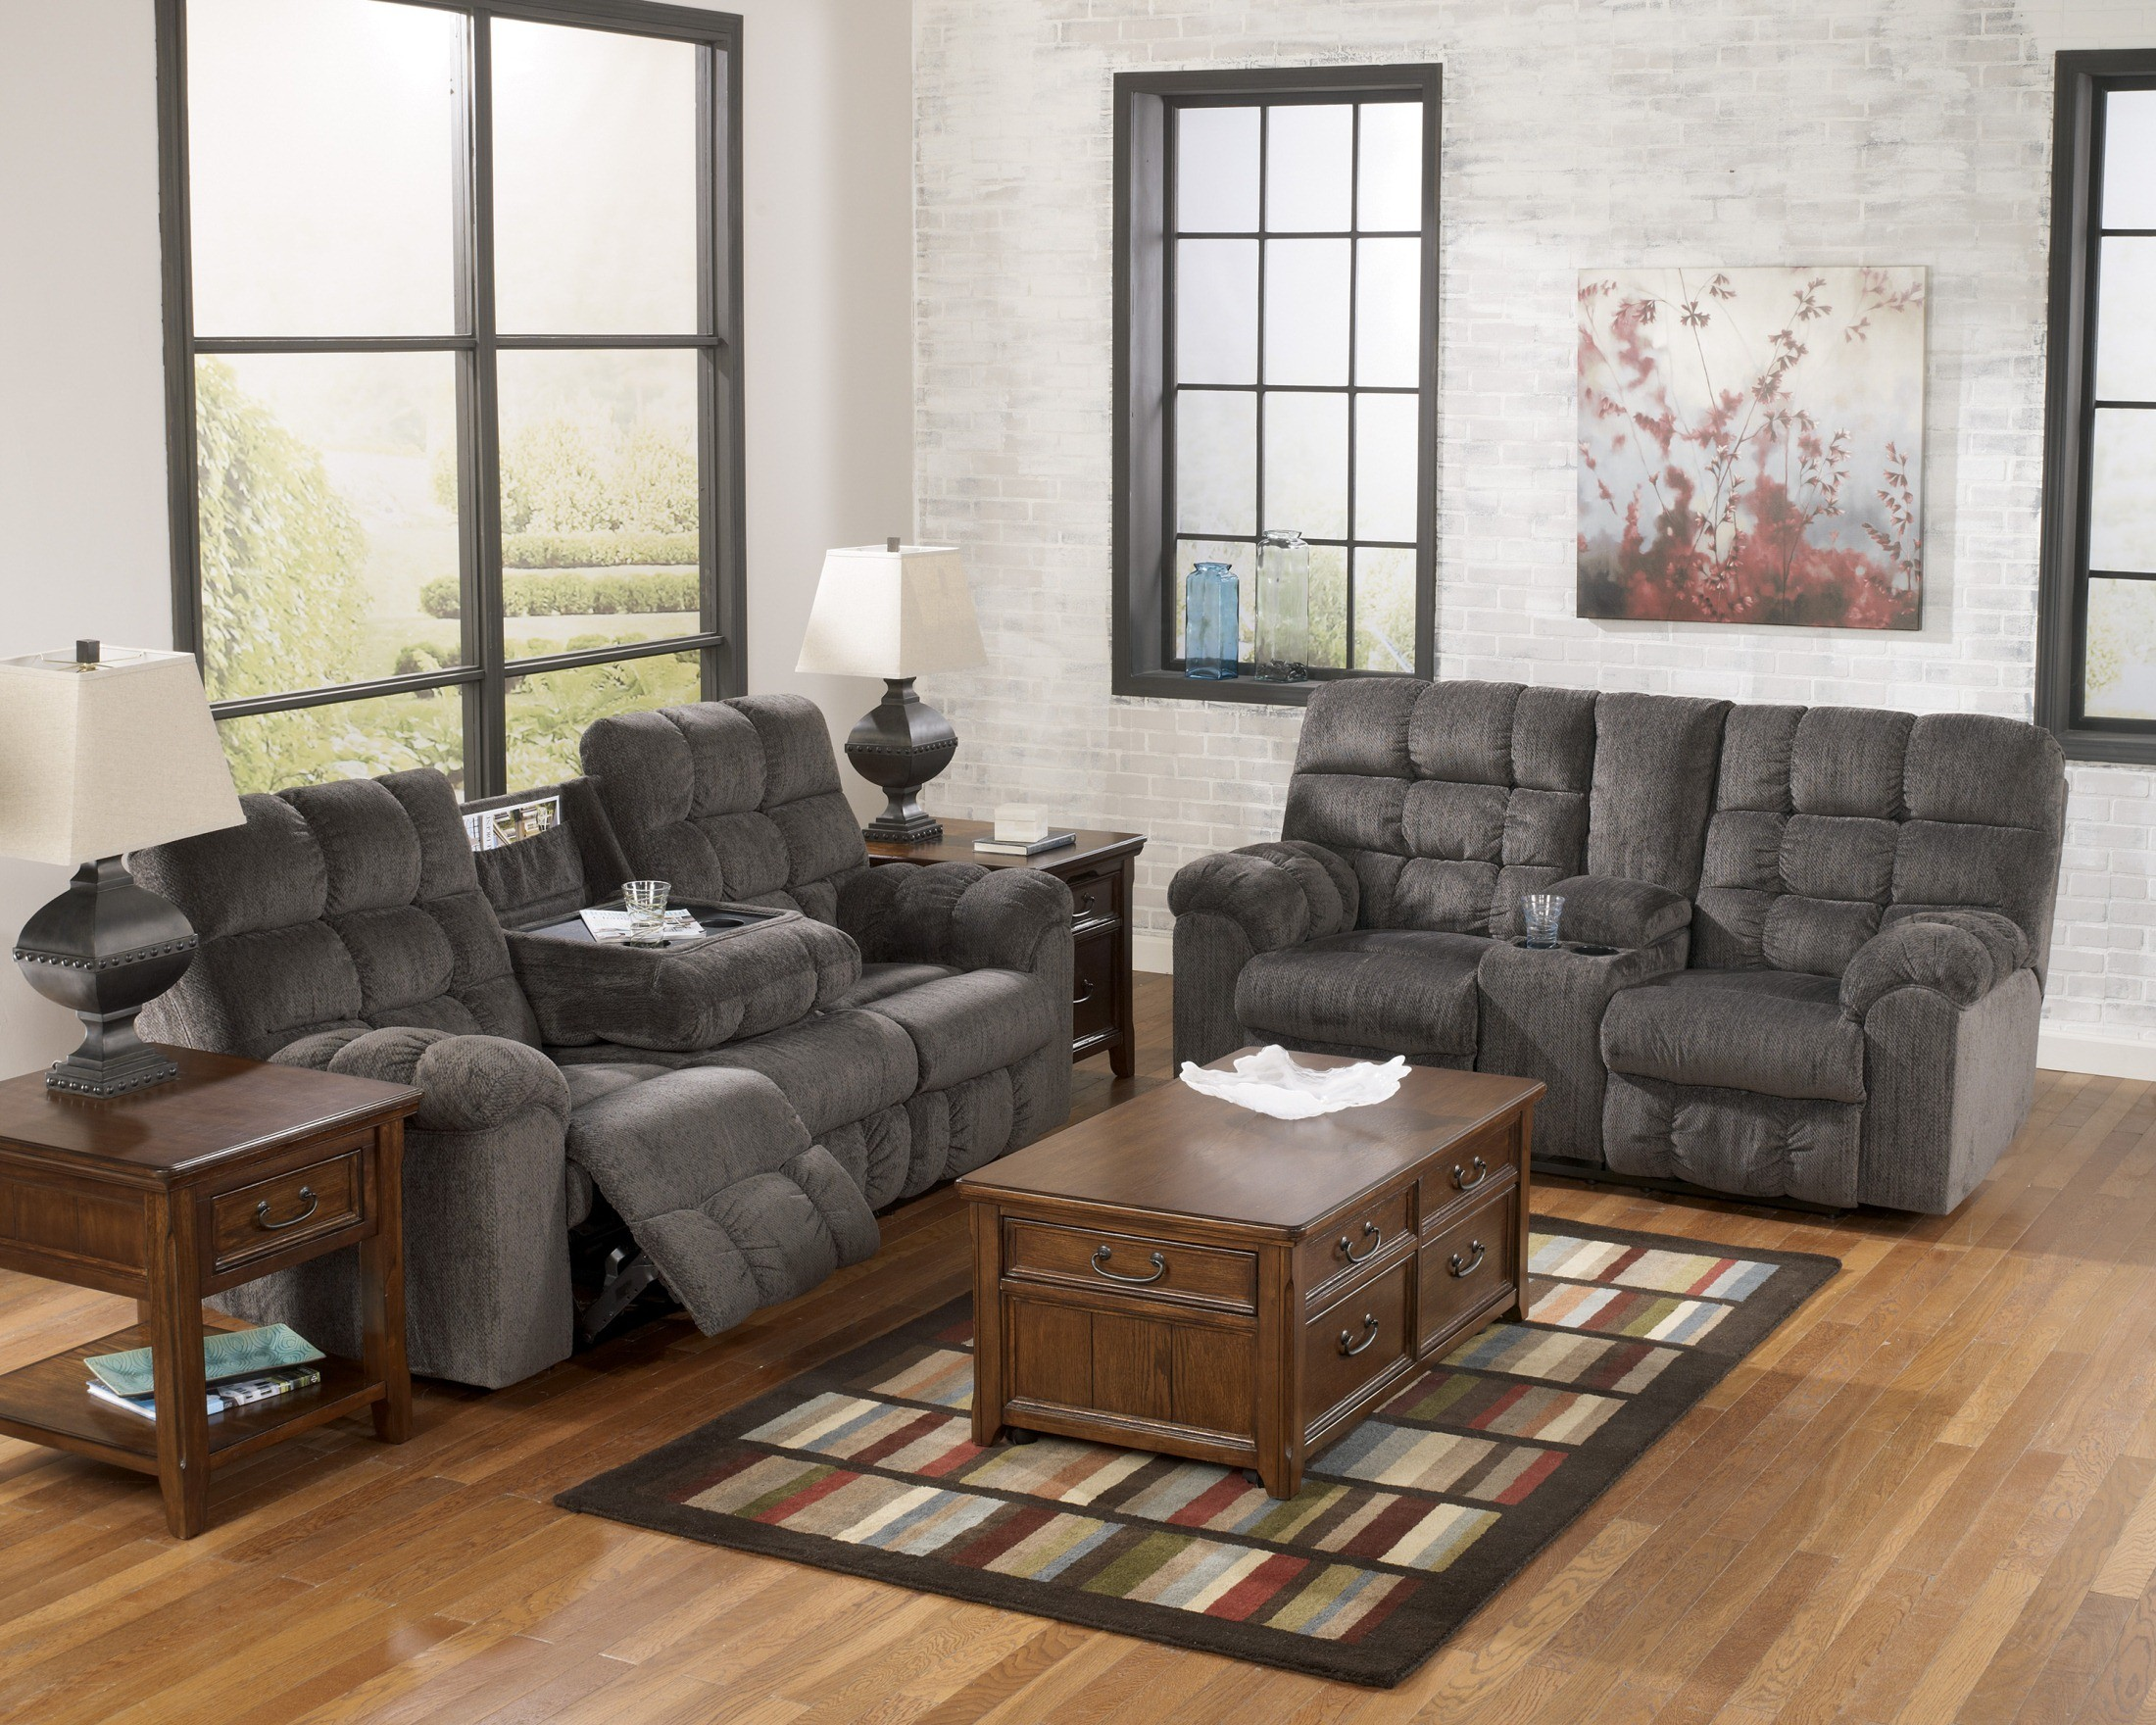 Acieona Slate Living Room Set From Ashley 58300